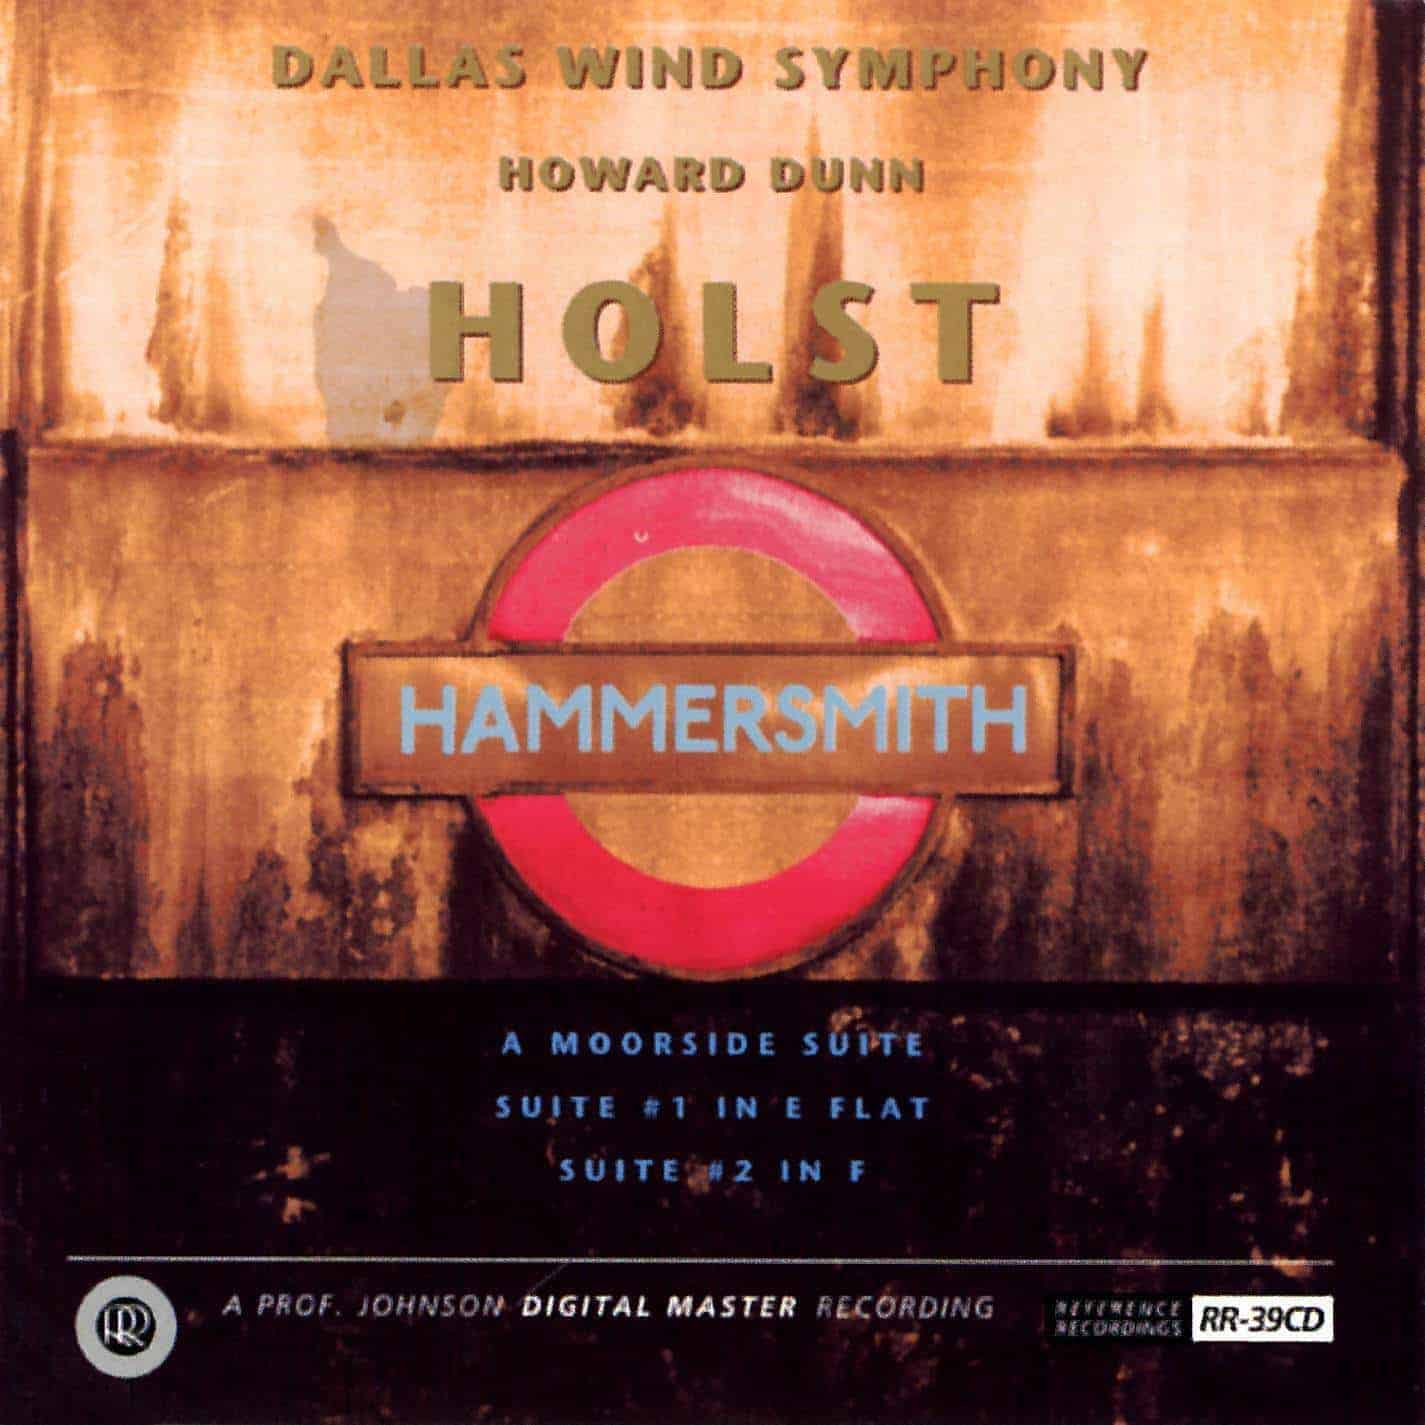 Holst: Hammersmith | Dallas Wind Symphony